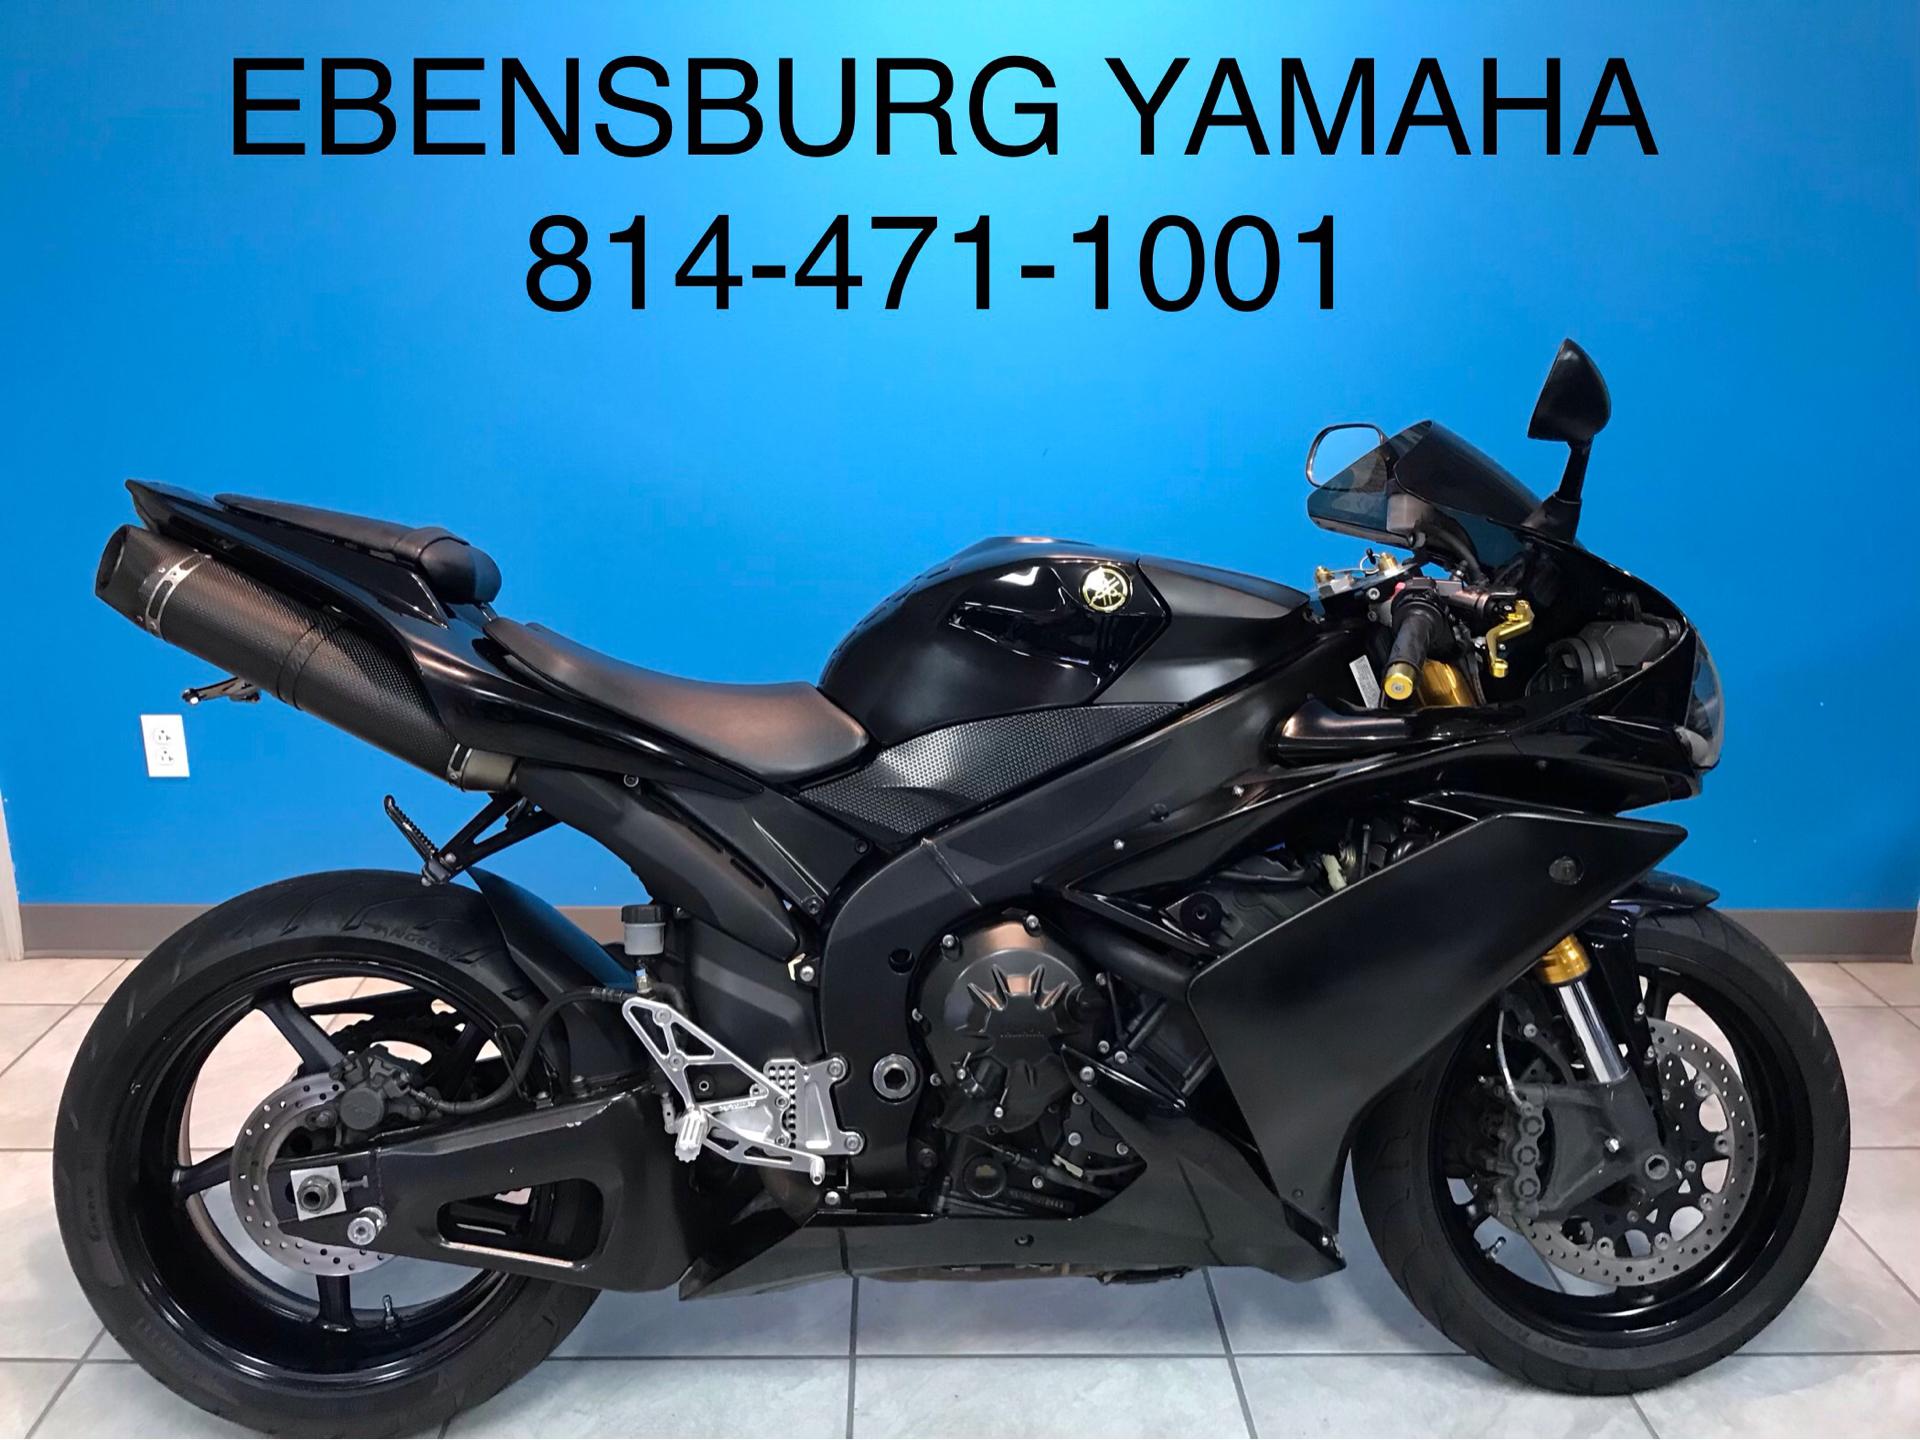 2008 Yamaha YZF-R1 for sale 37918